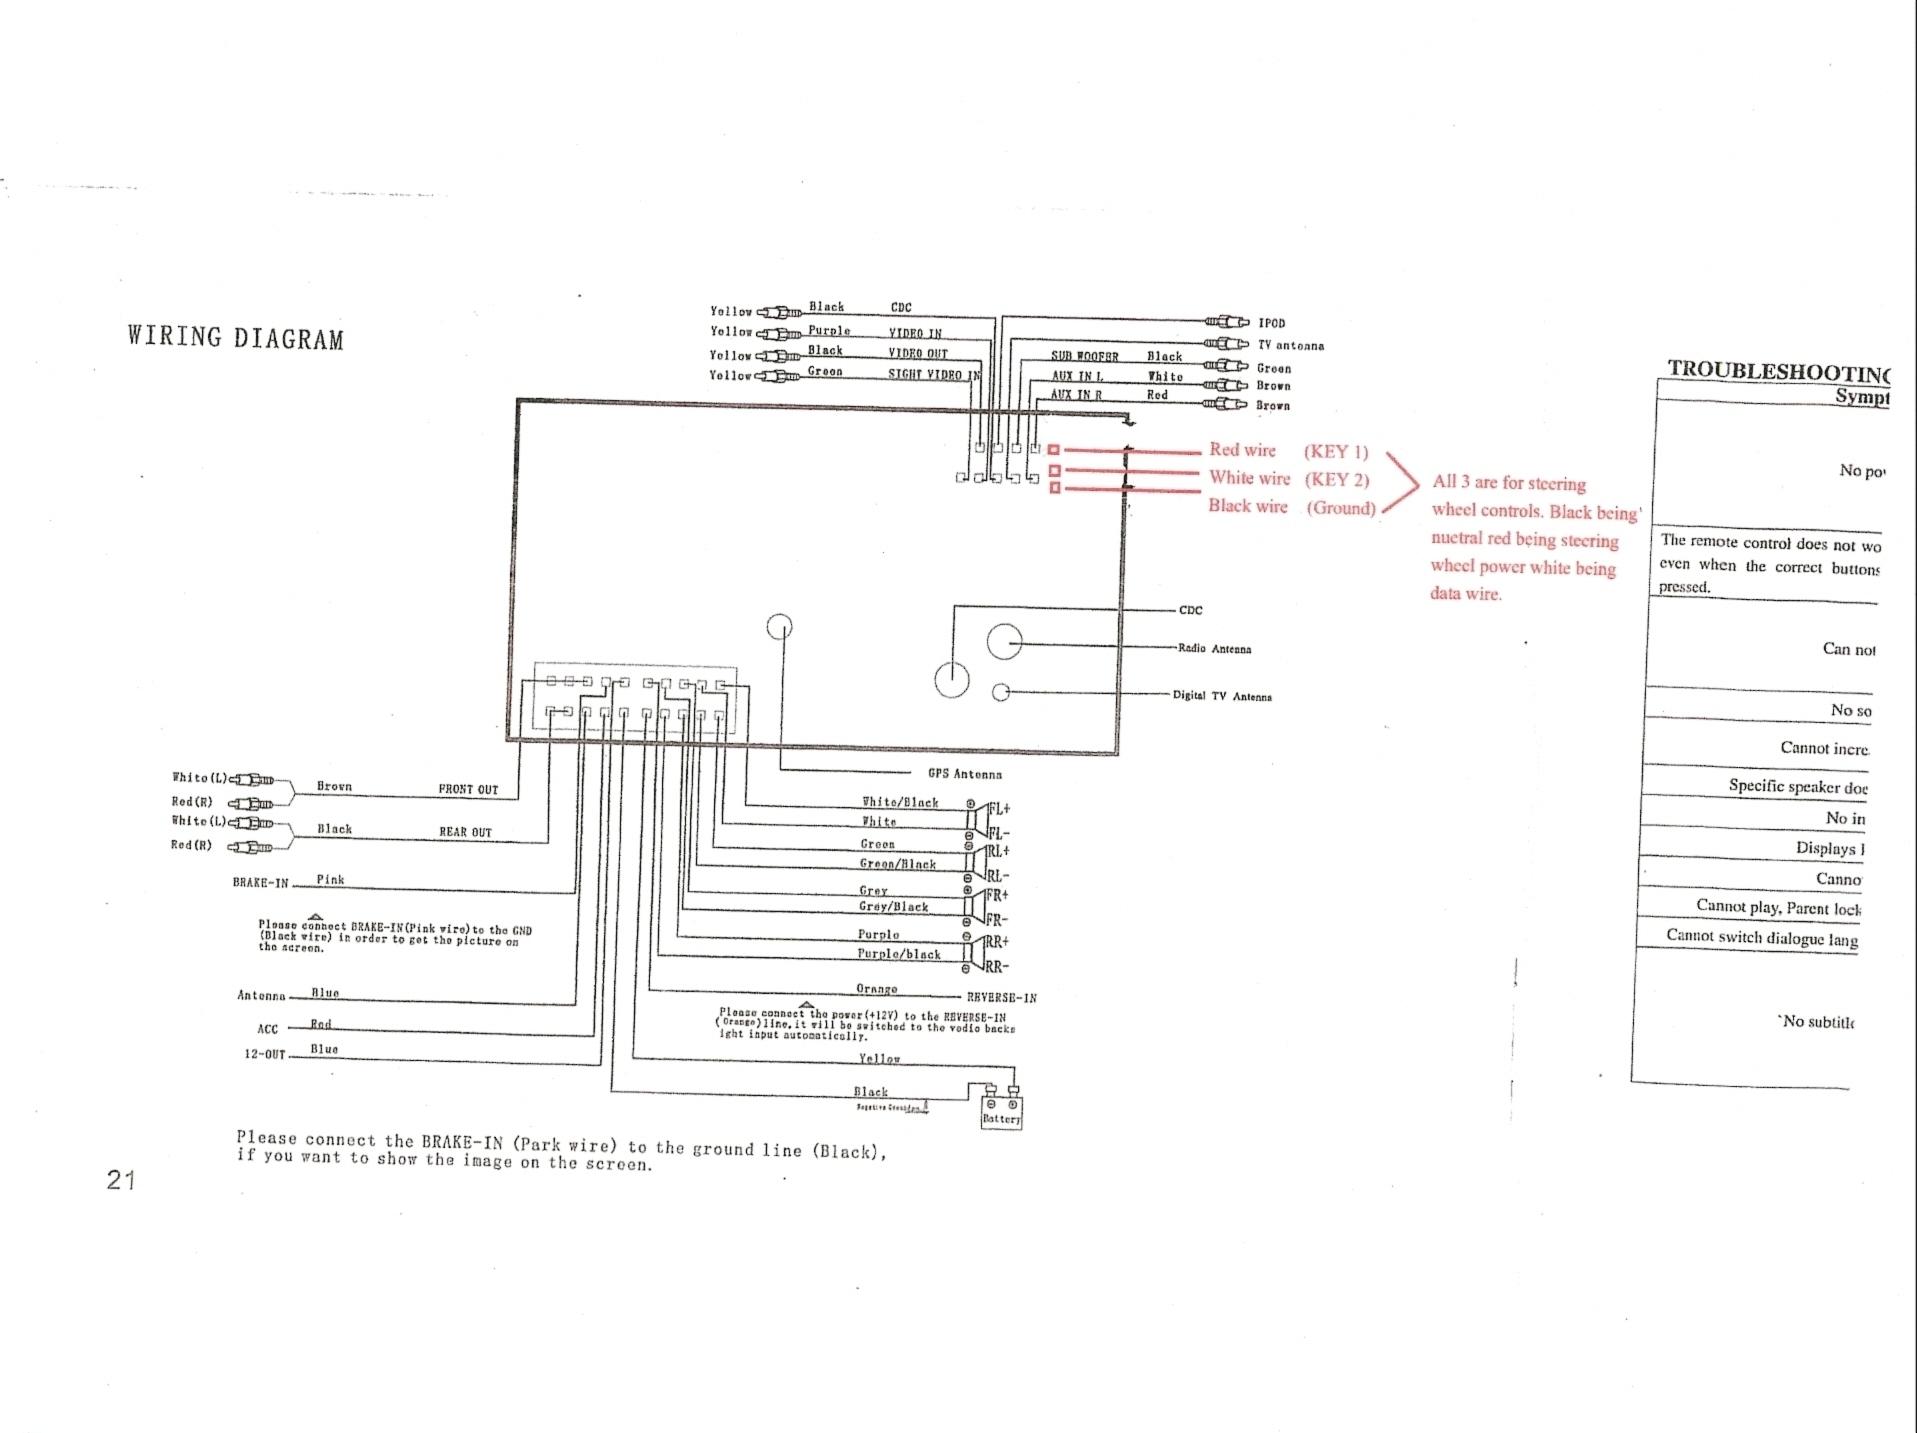 New head unit wiring help needed Chevy TrailBlazer TrailBlazer – Gmos 06 Wiring Diagram